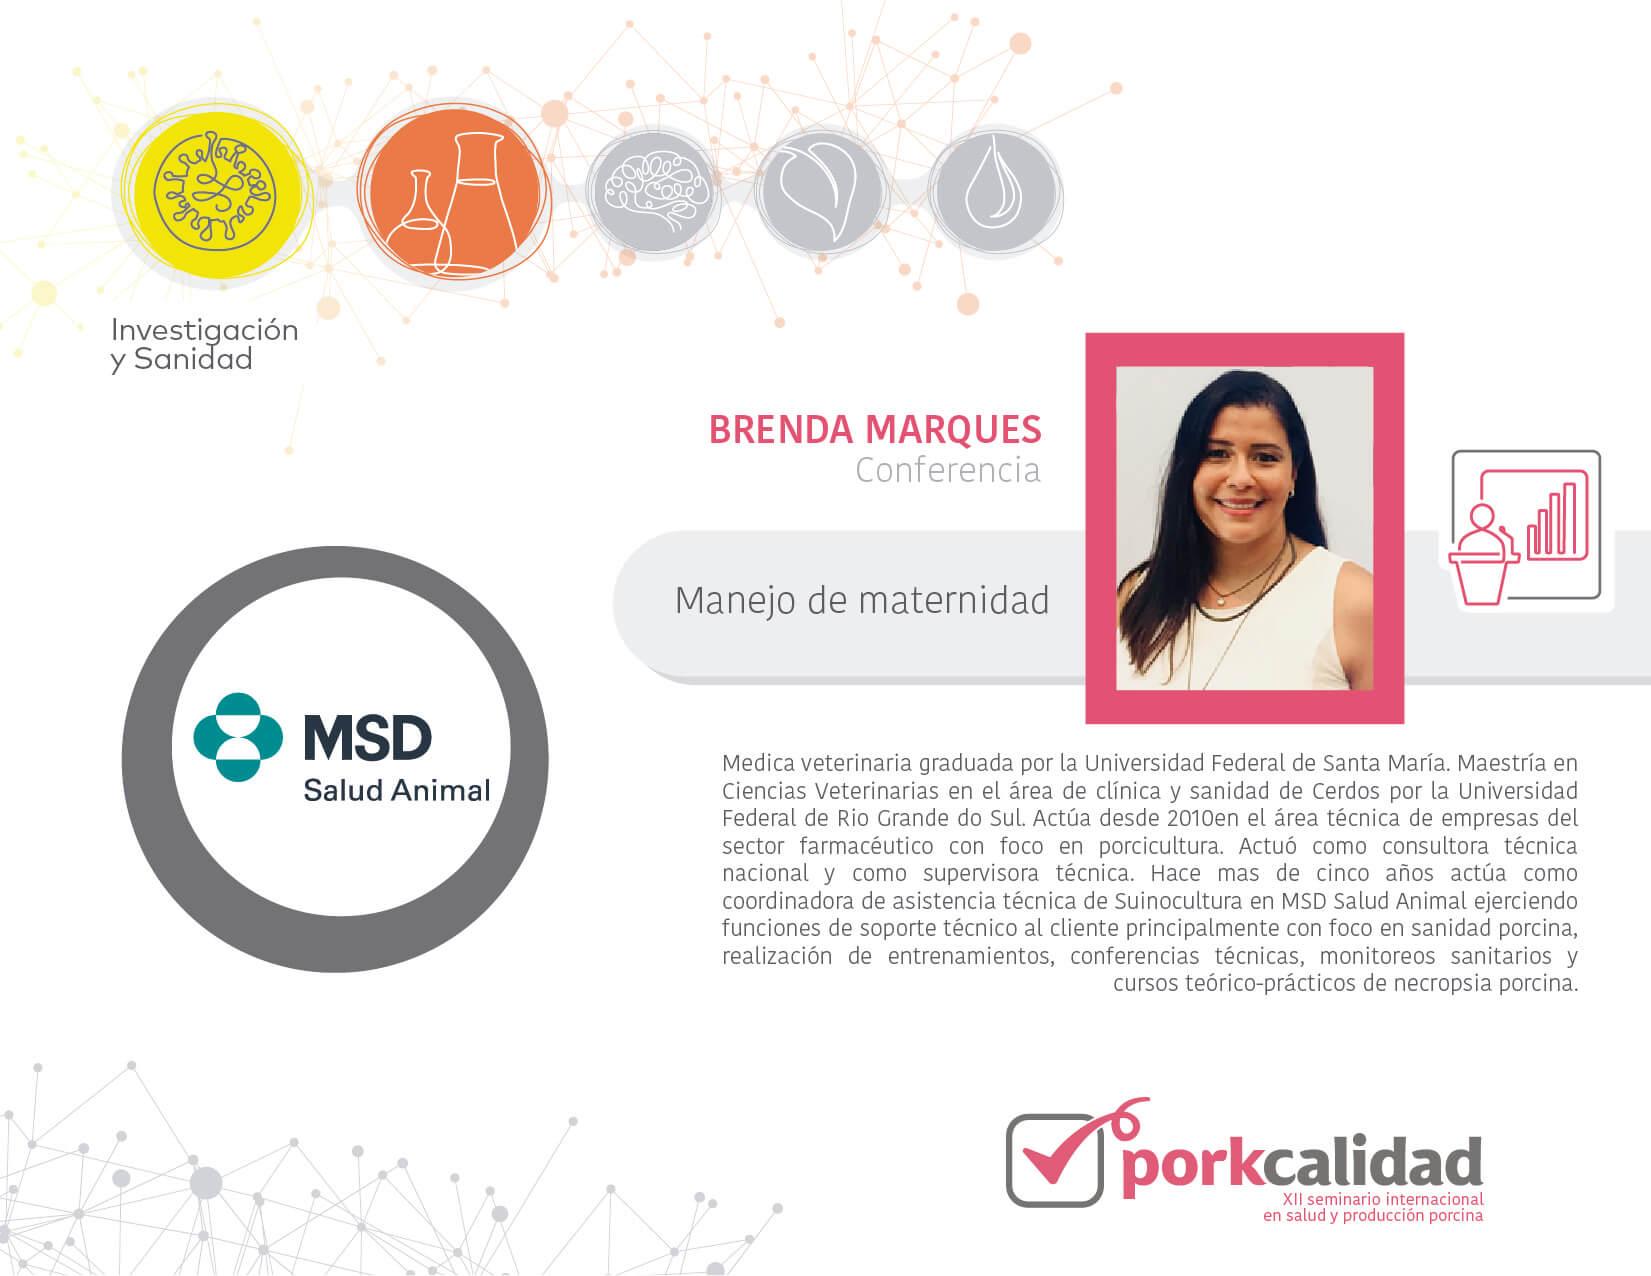 Porkcalidad2019_MSD_BrendaM (1)